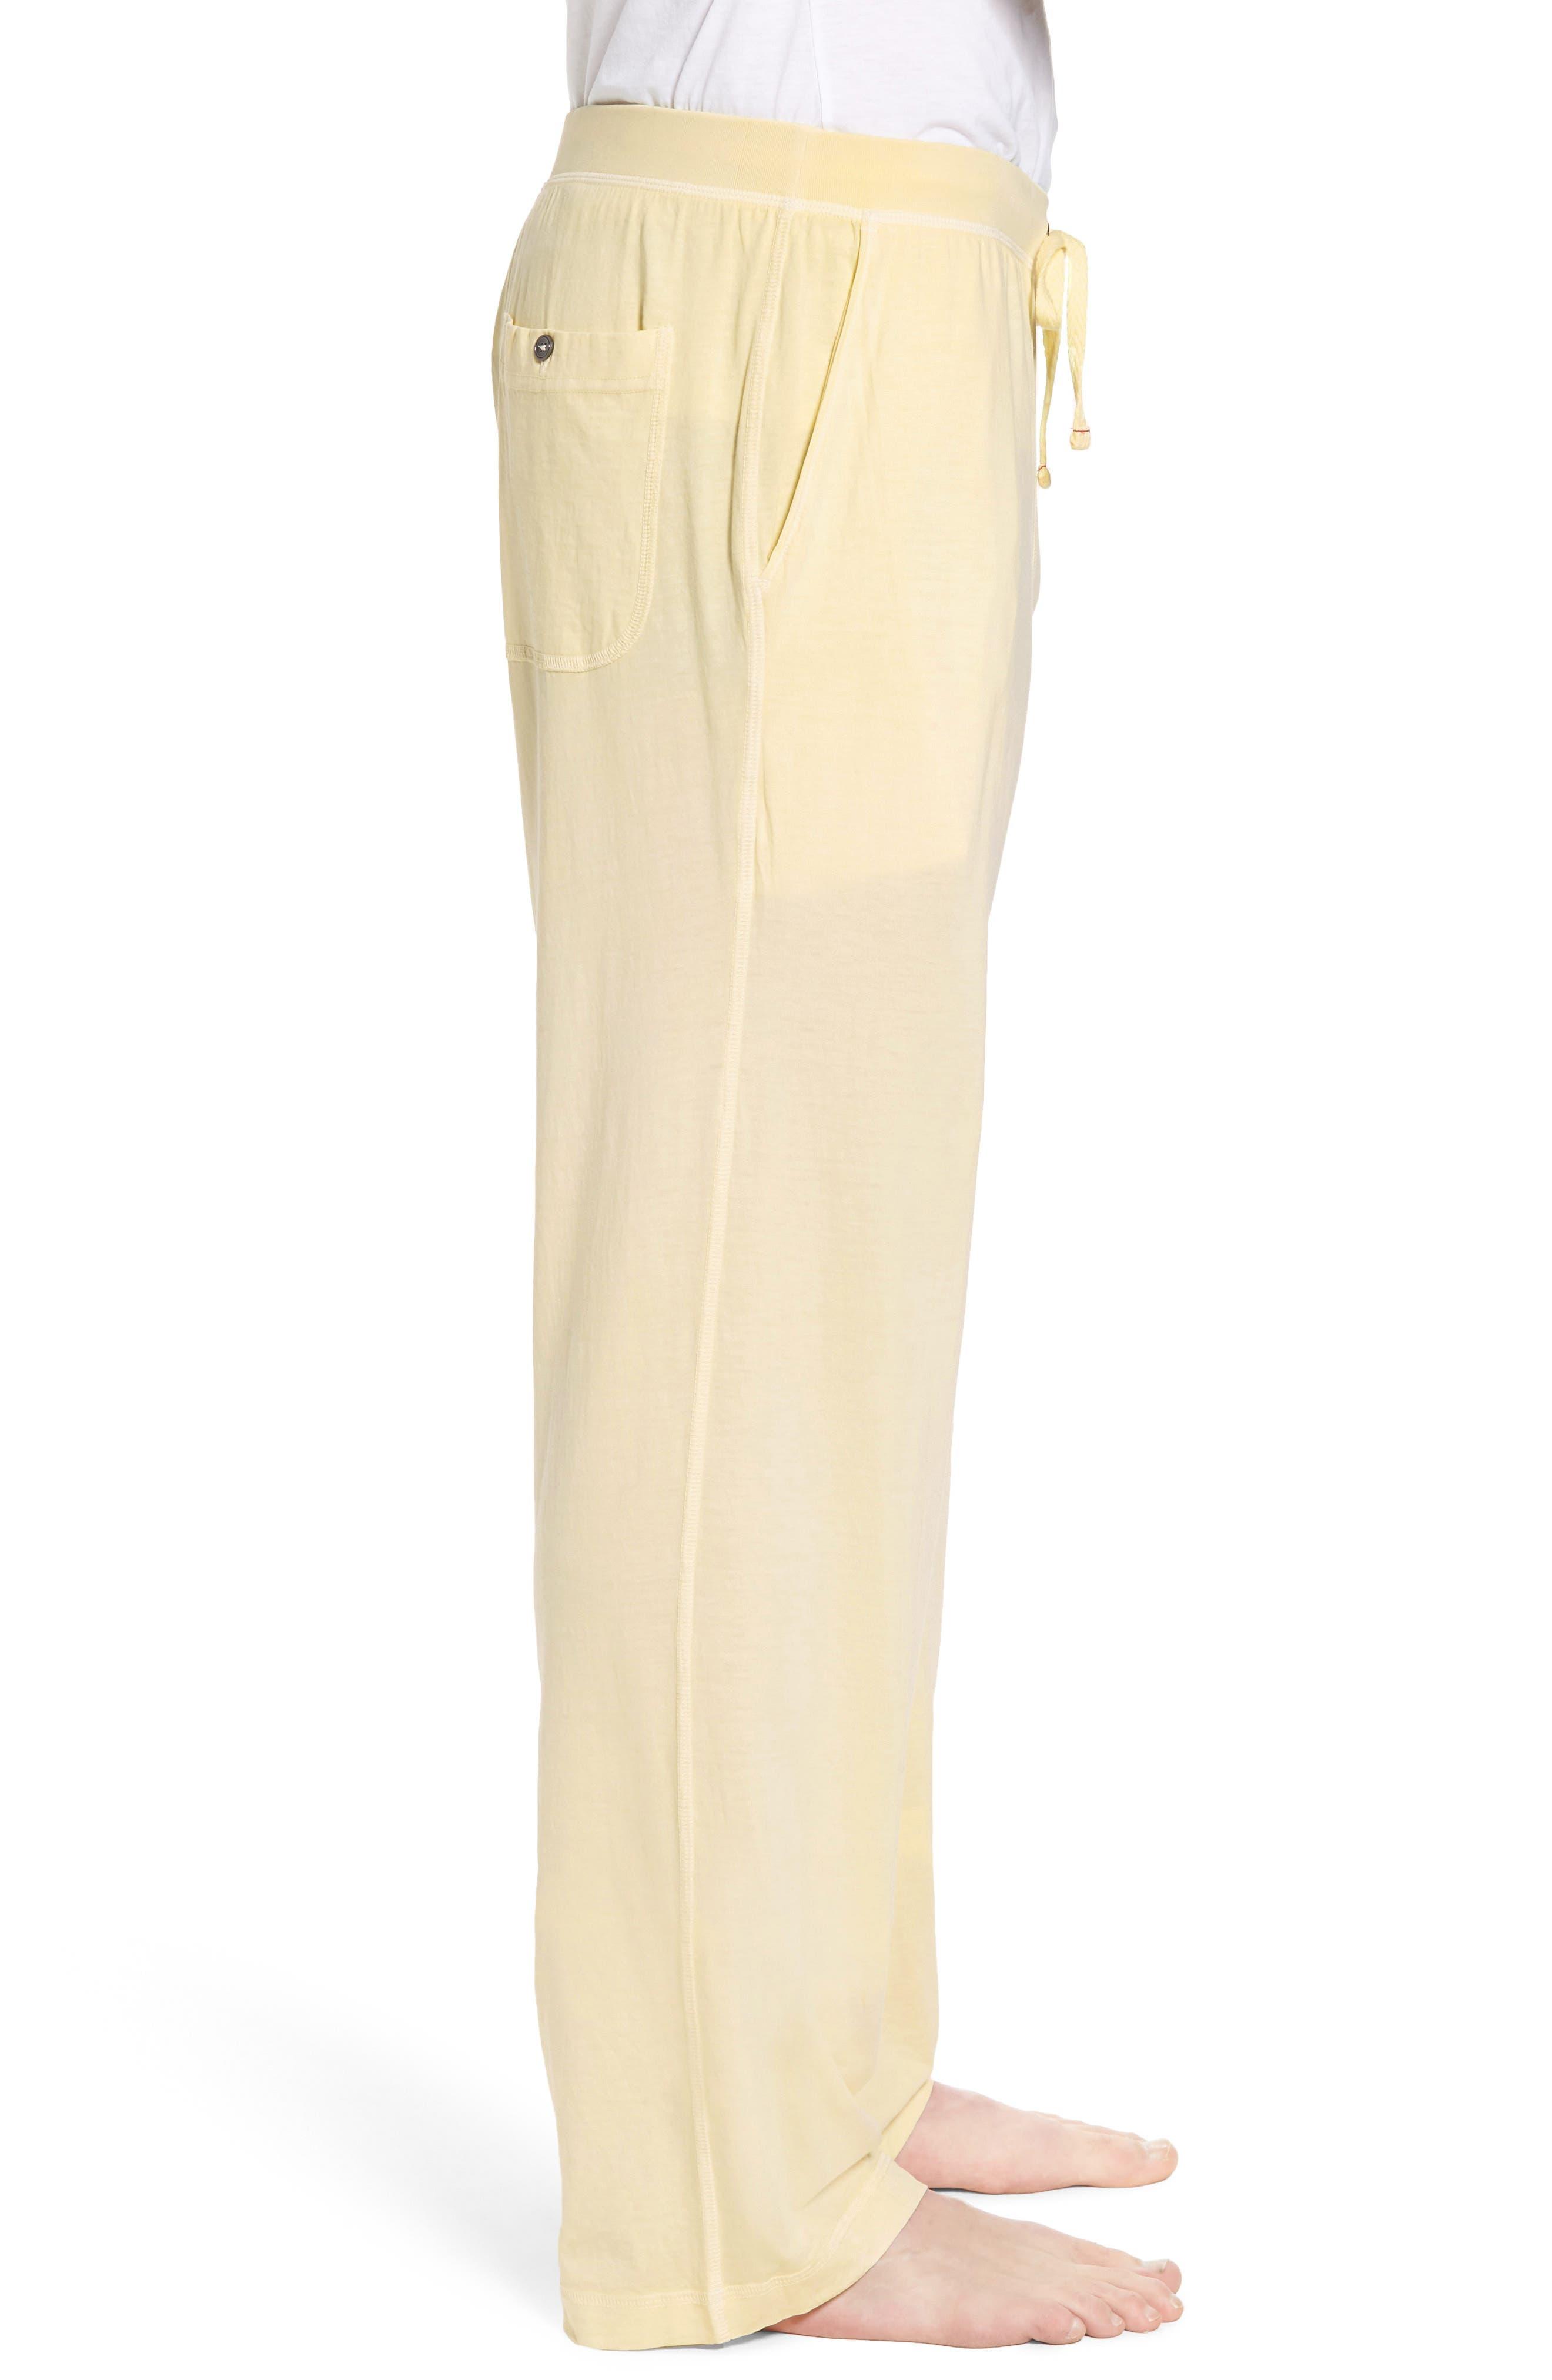 Peruvian Pima Cotton Lounge Pants,                             Alternate thumbnail 3, color,                             YELLOW